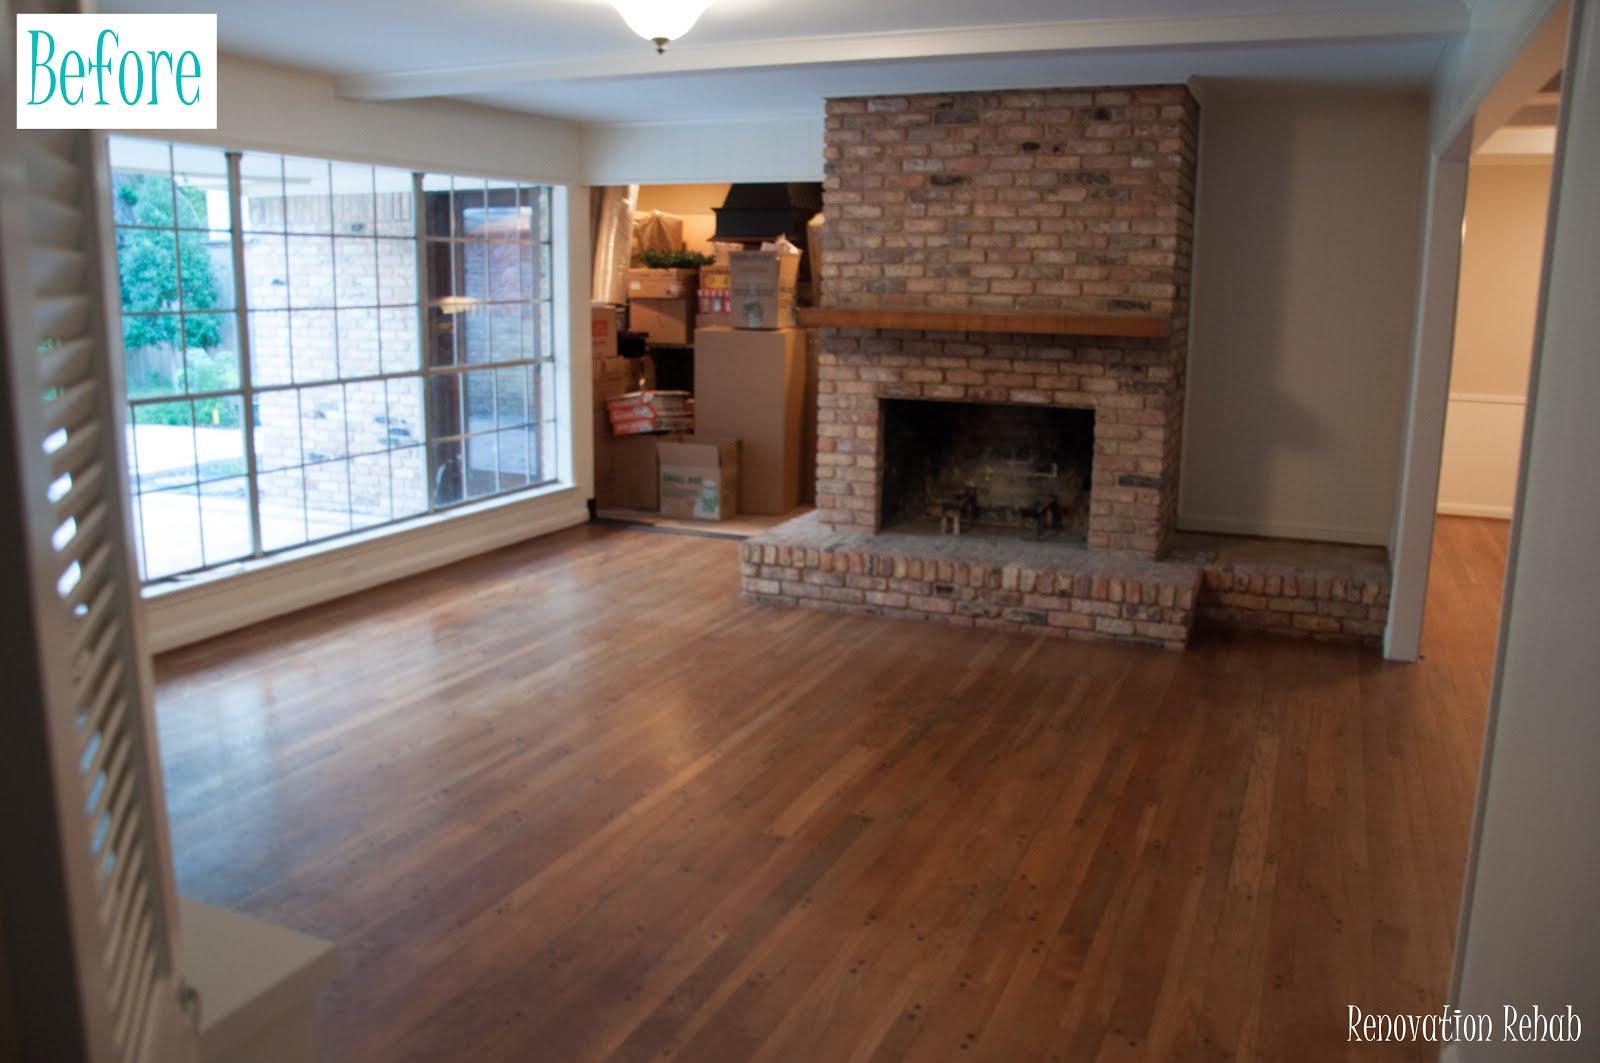 Renovation rehab reclaiming salvaged hardwood floors for Hardwood floors throughout